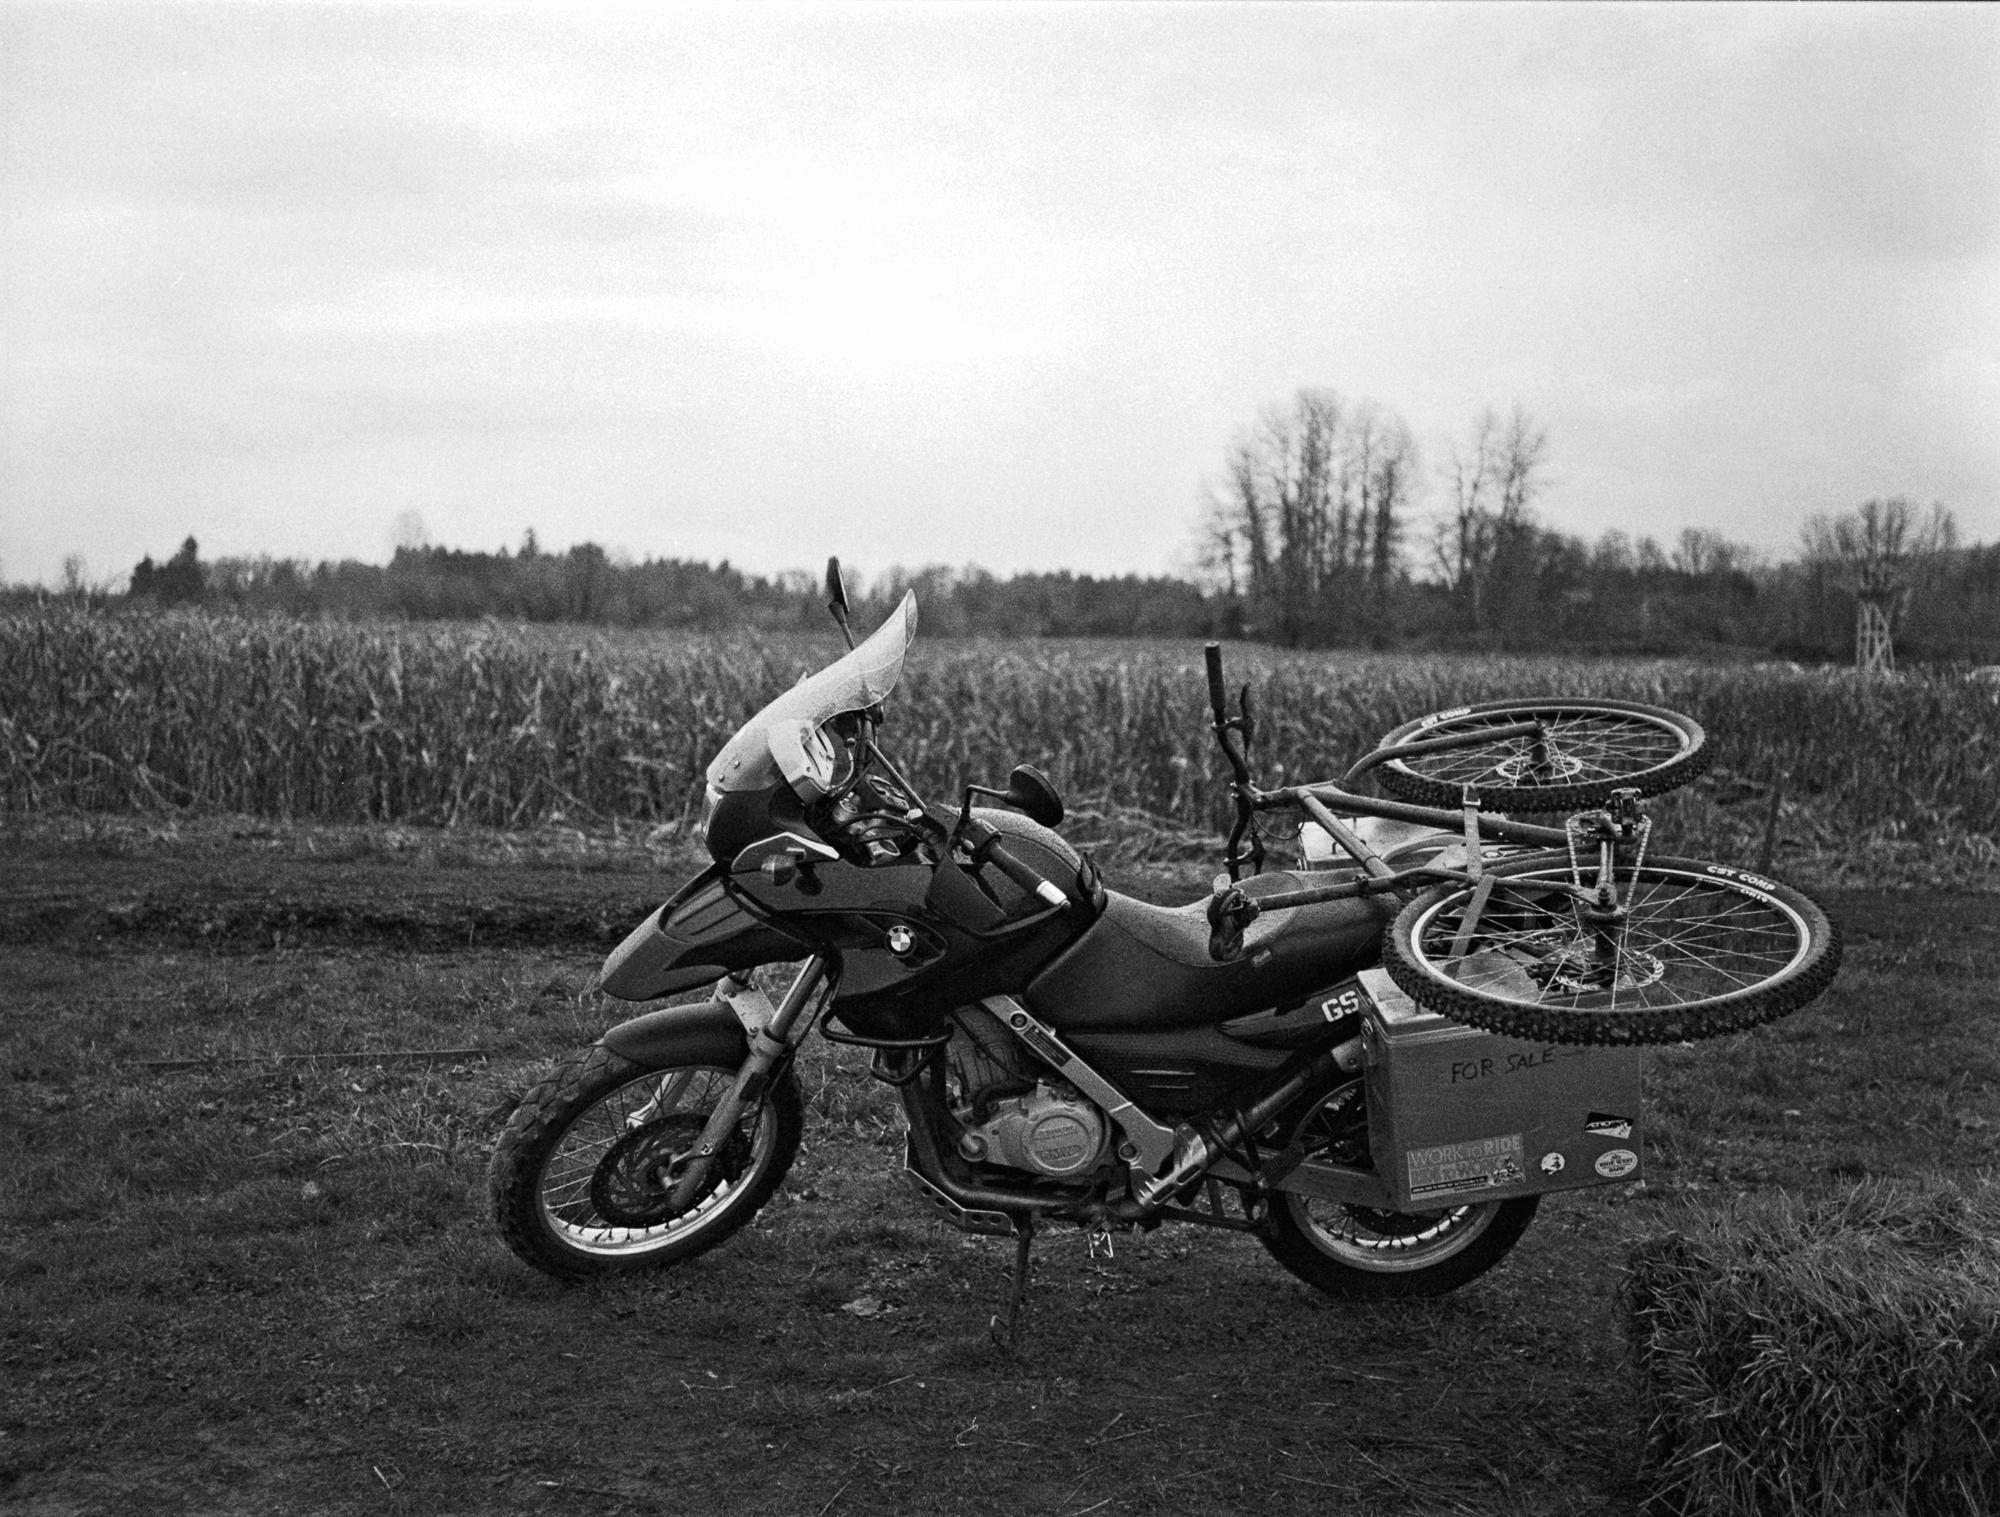 bike-on-bike-action-damian-riehl